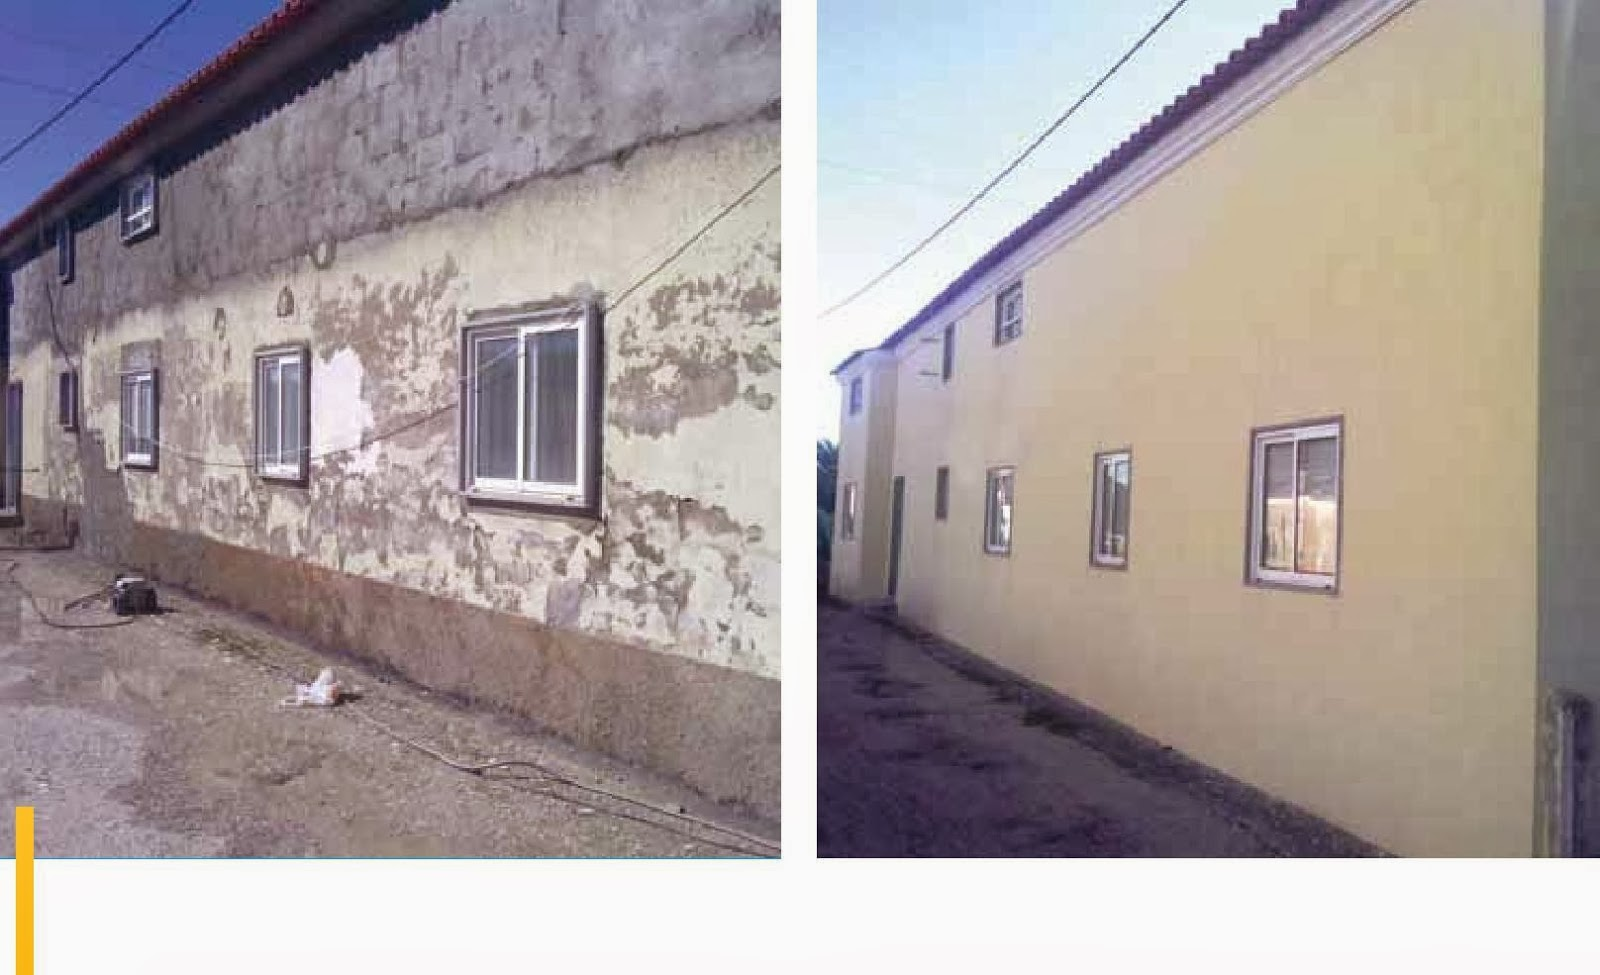 sistema-therminnov-eps-grafite-crepimil-s-pintar-a-casa-tintas-2000